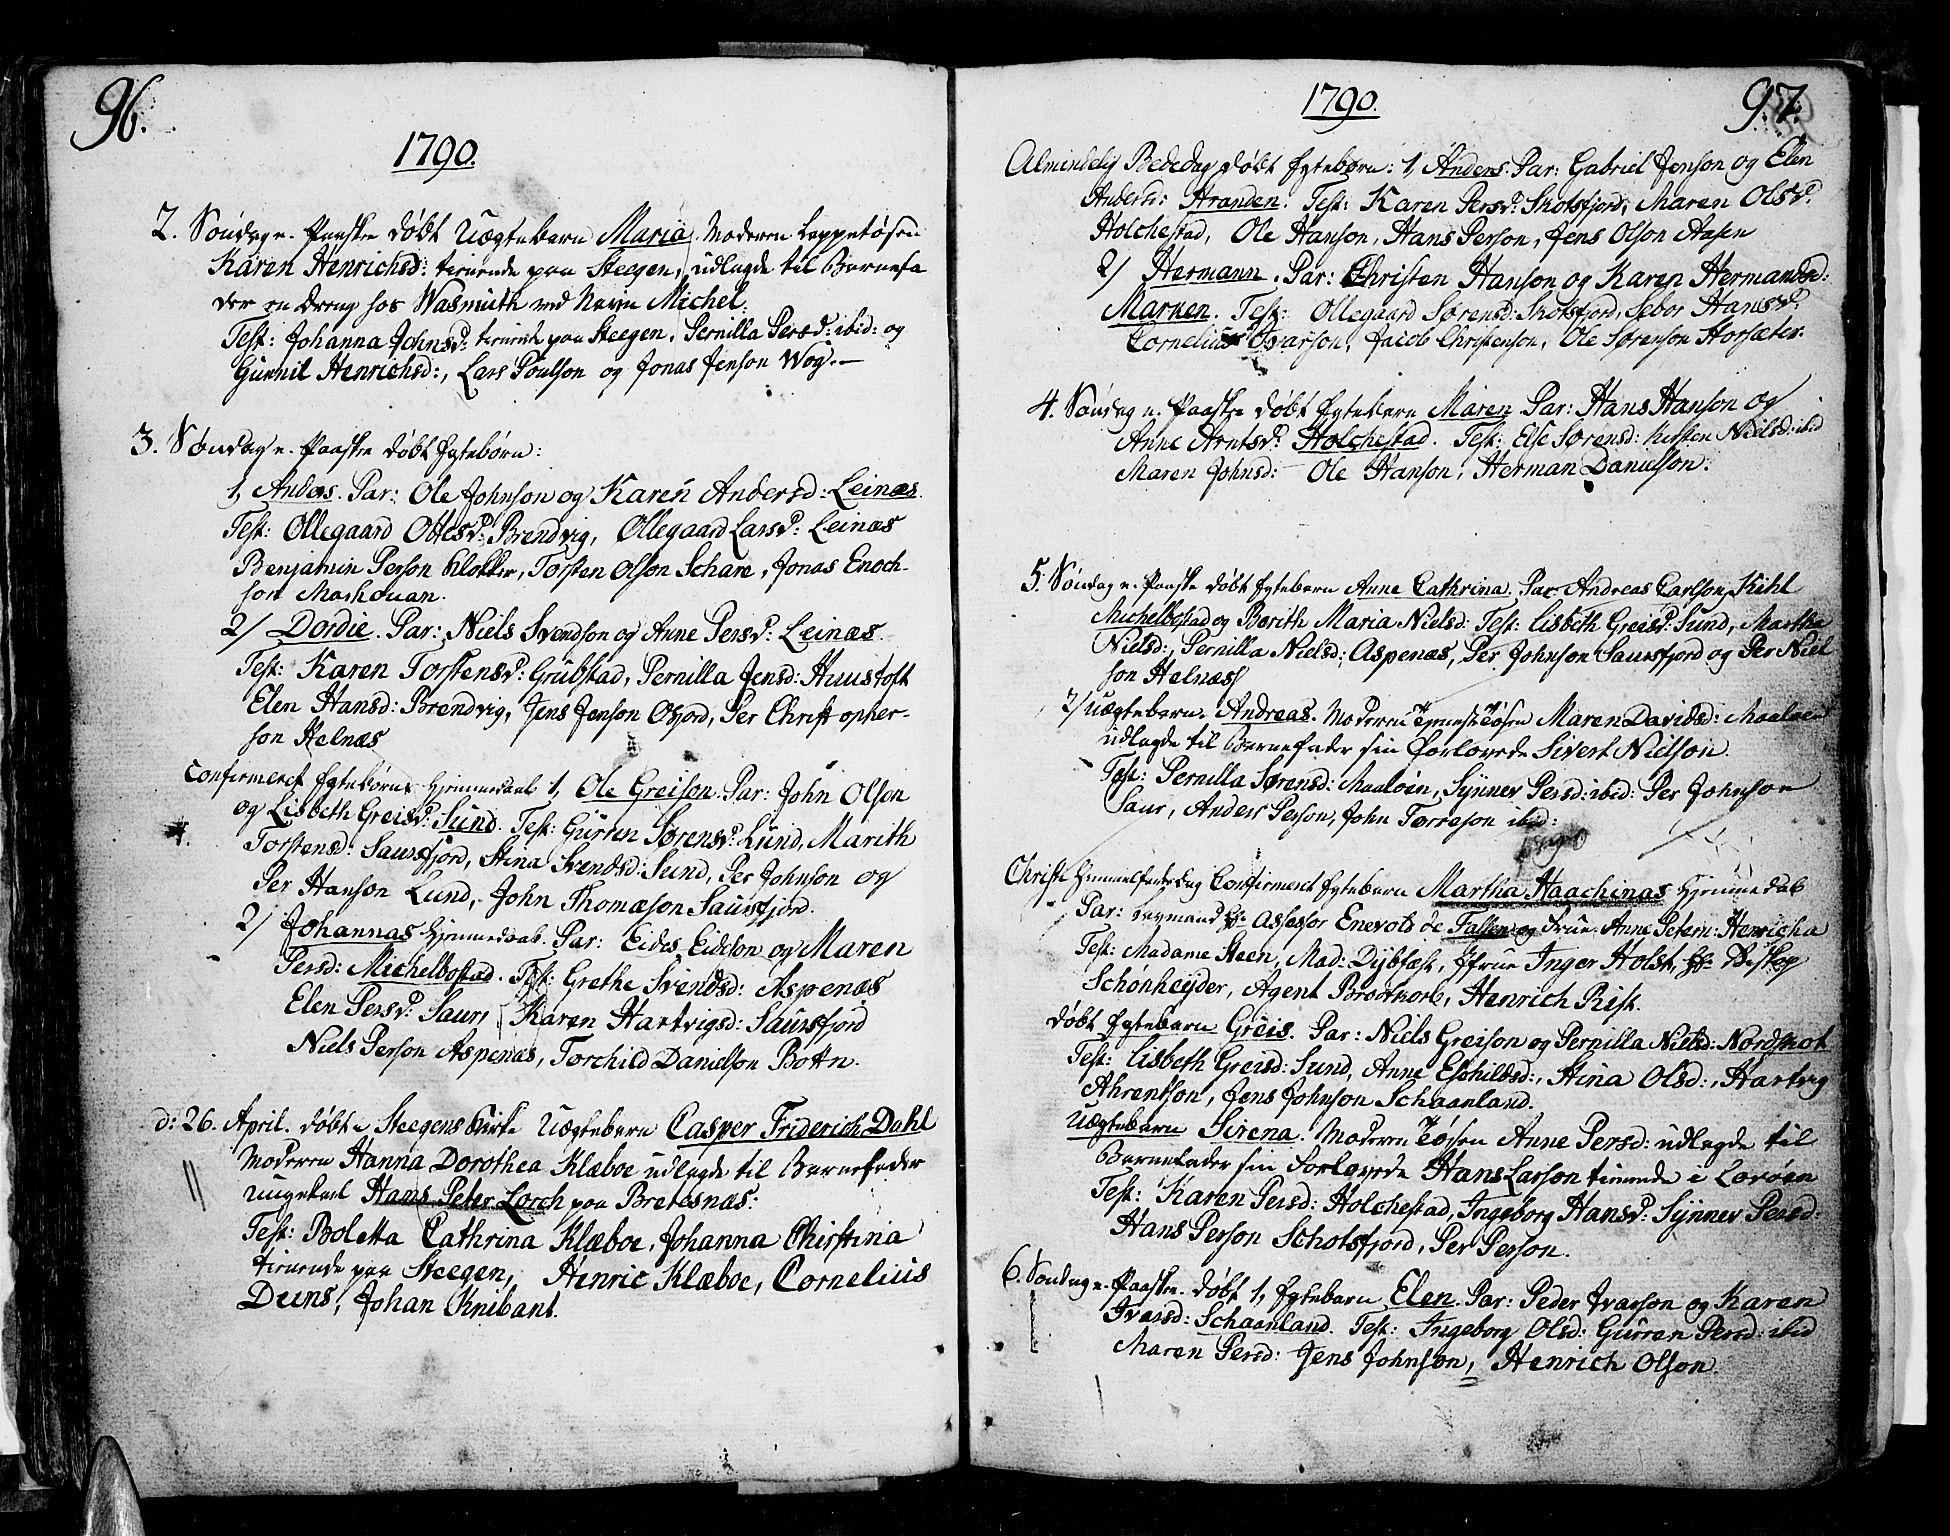 SAT, Ministerialprotokoller, klokkerbøker og fødselsregistre - Nordland, 855/L0796: Ministerialbok nr. 855A04, 1776-1813, s. 96-97